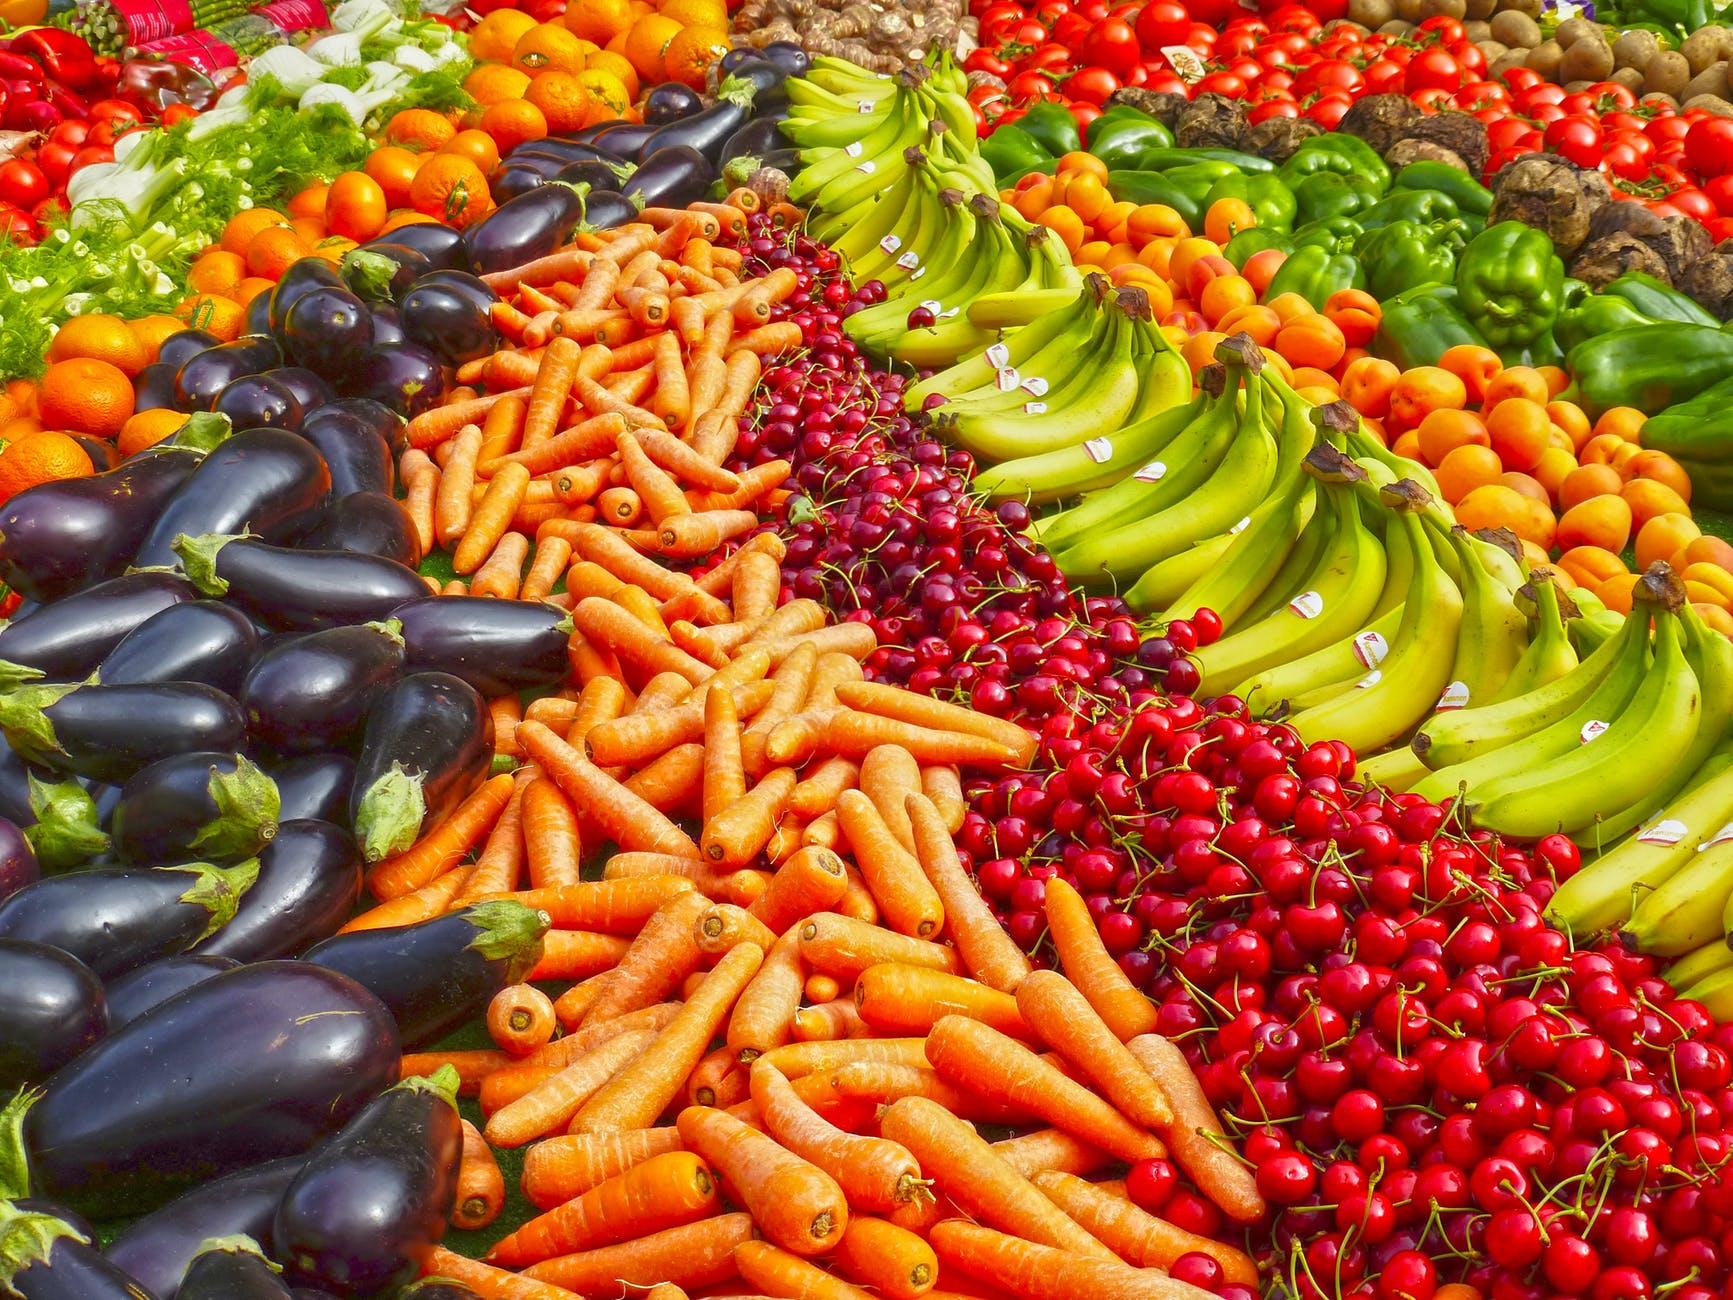 abundance agriculture bananas batch